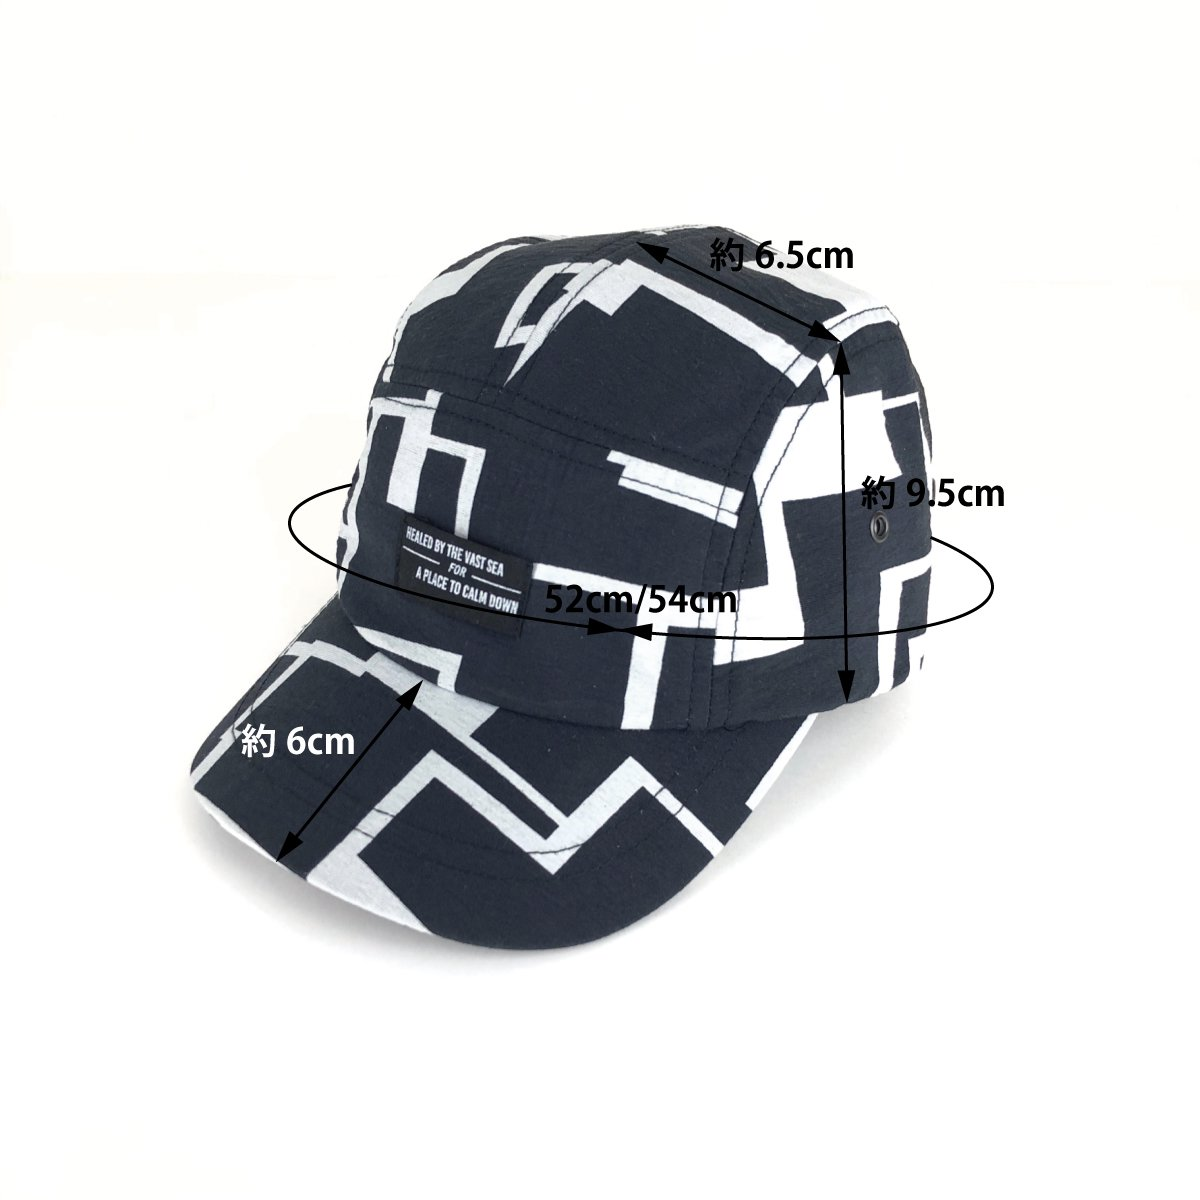 【KIDS】Monotone Jet Cap 詳細画像5